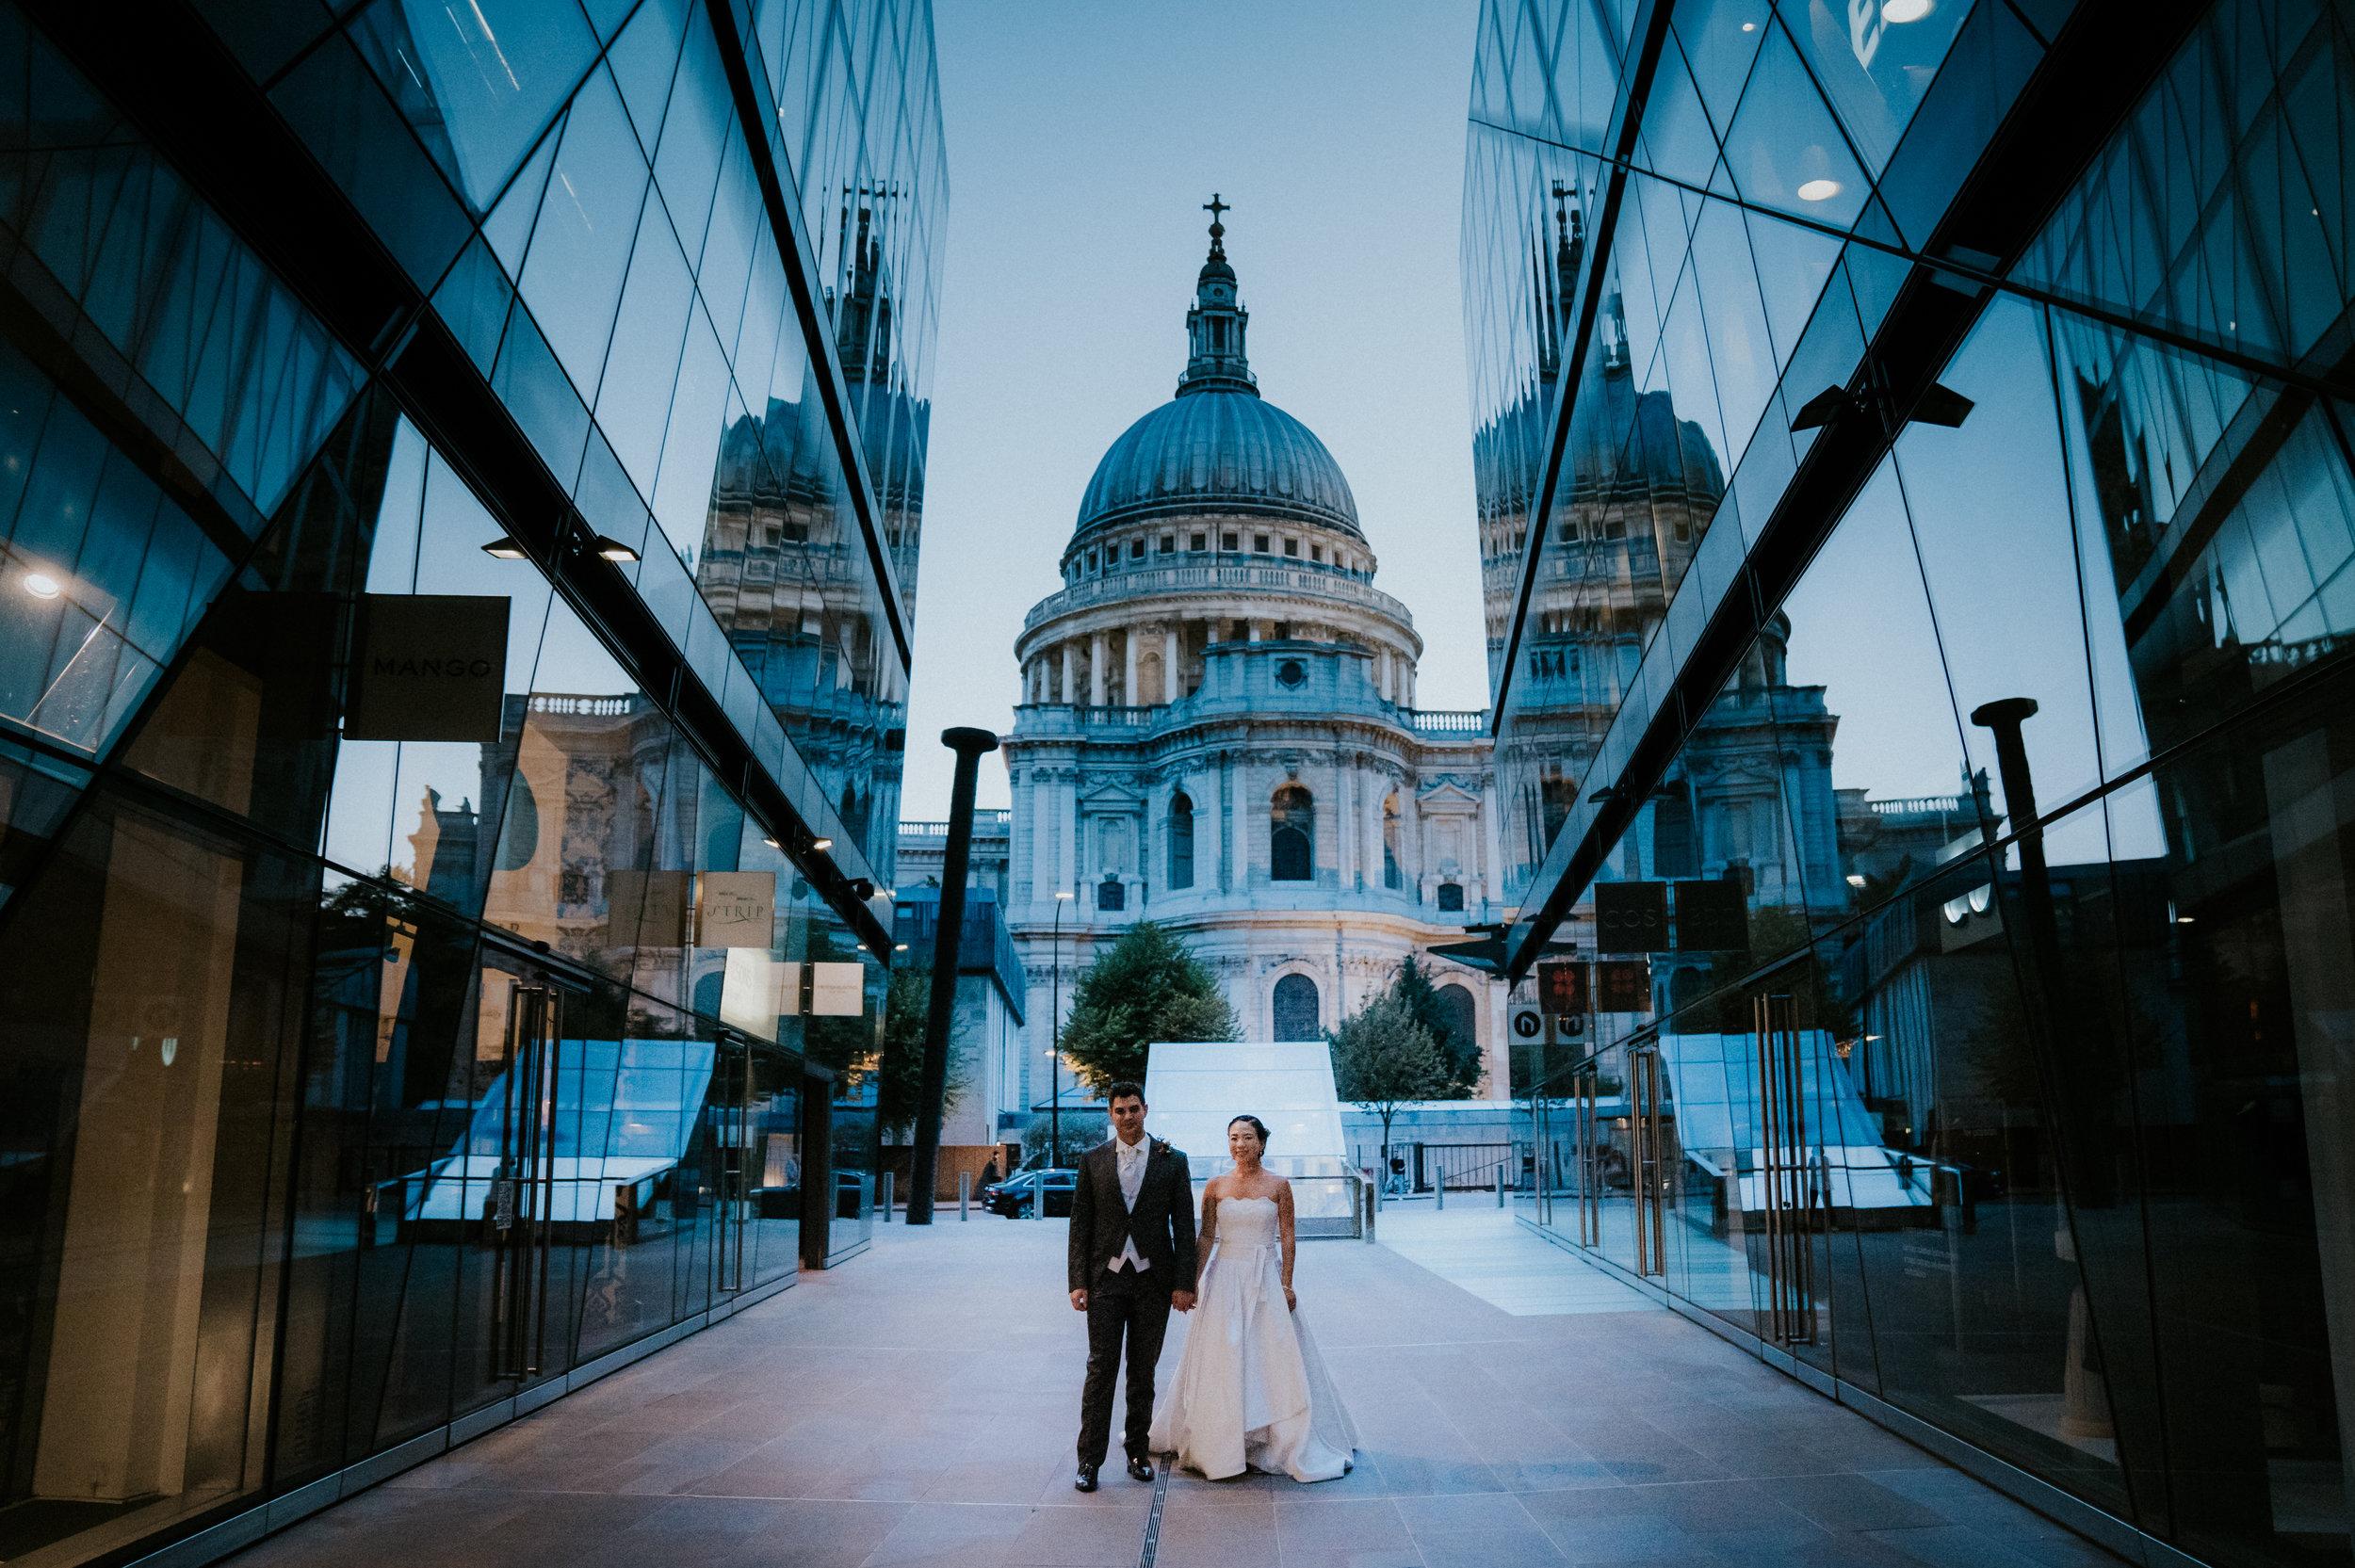 river-rooms-tower-bridge-london-stpauls-mondrian-hotel-wedding-photography-videography-79